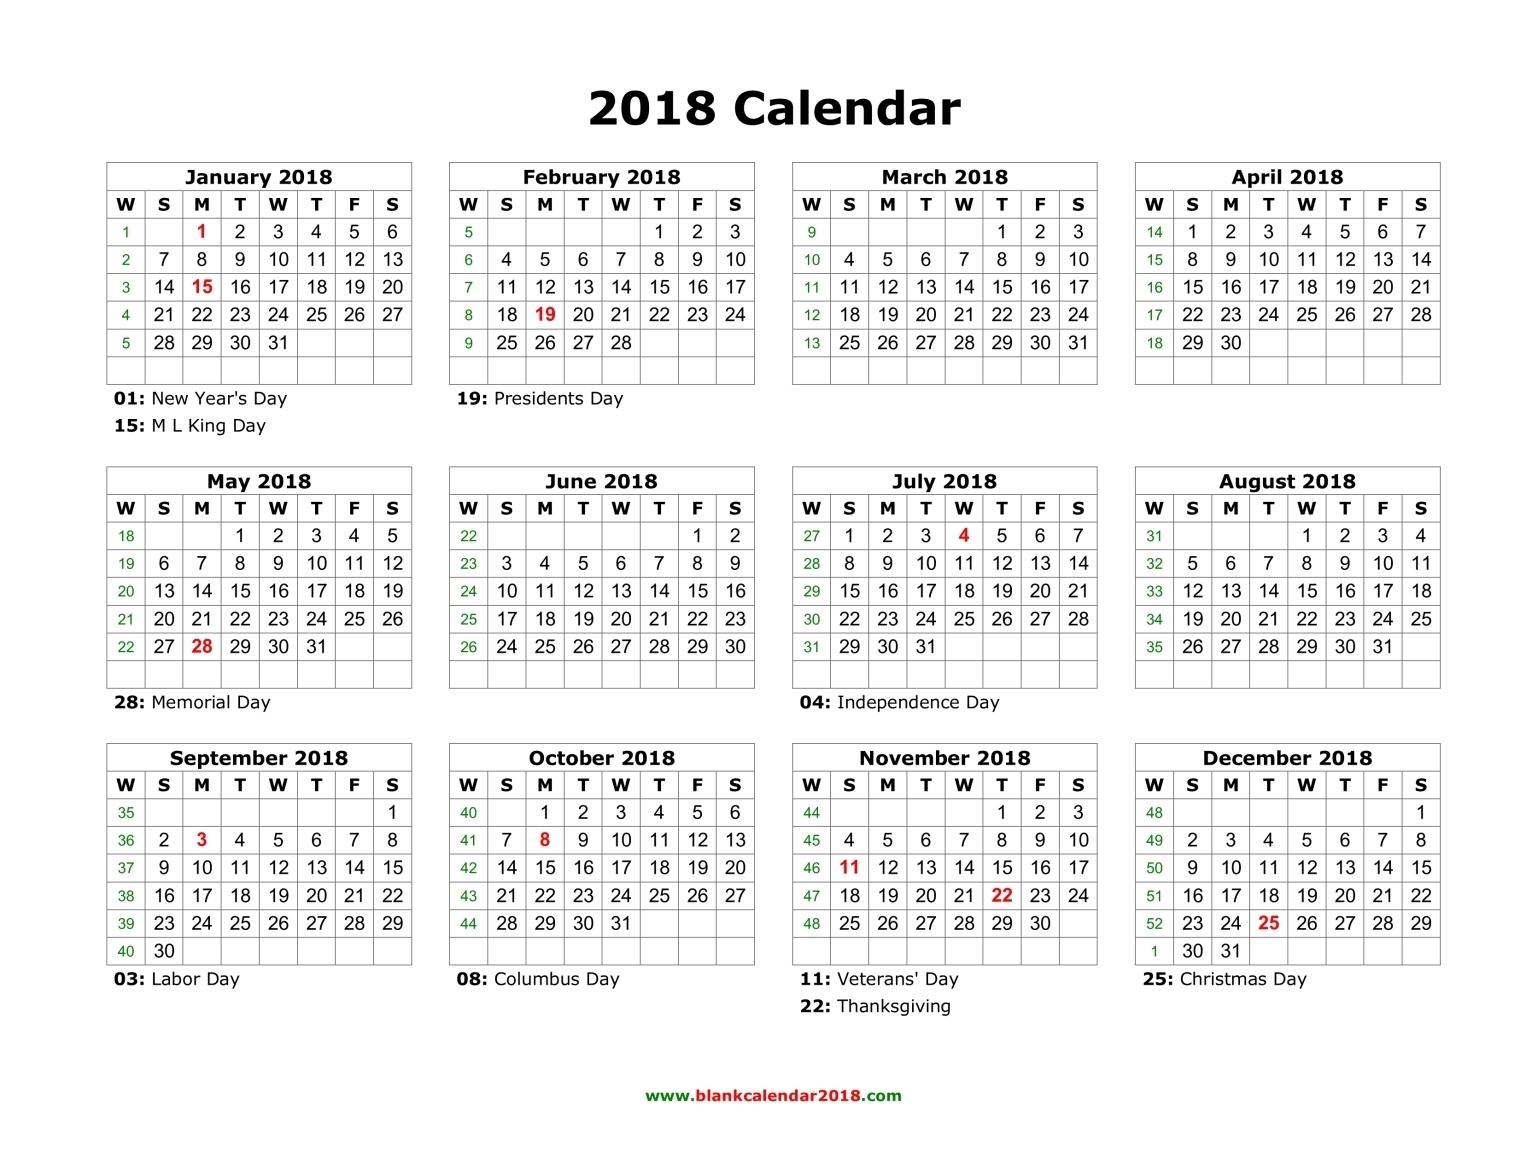 blank holidays calendar 2018 landscape